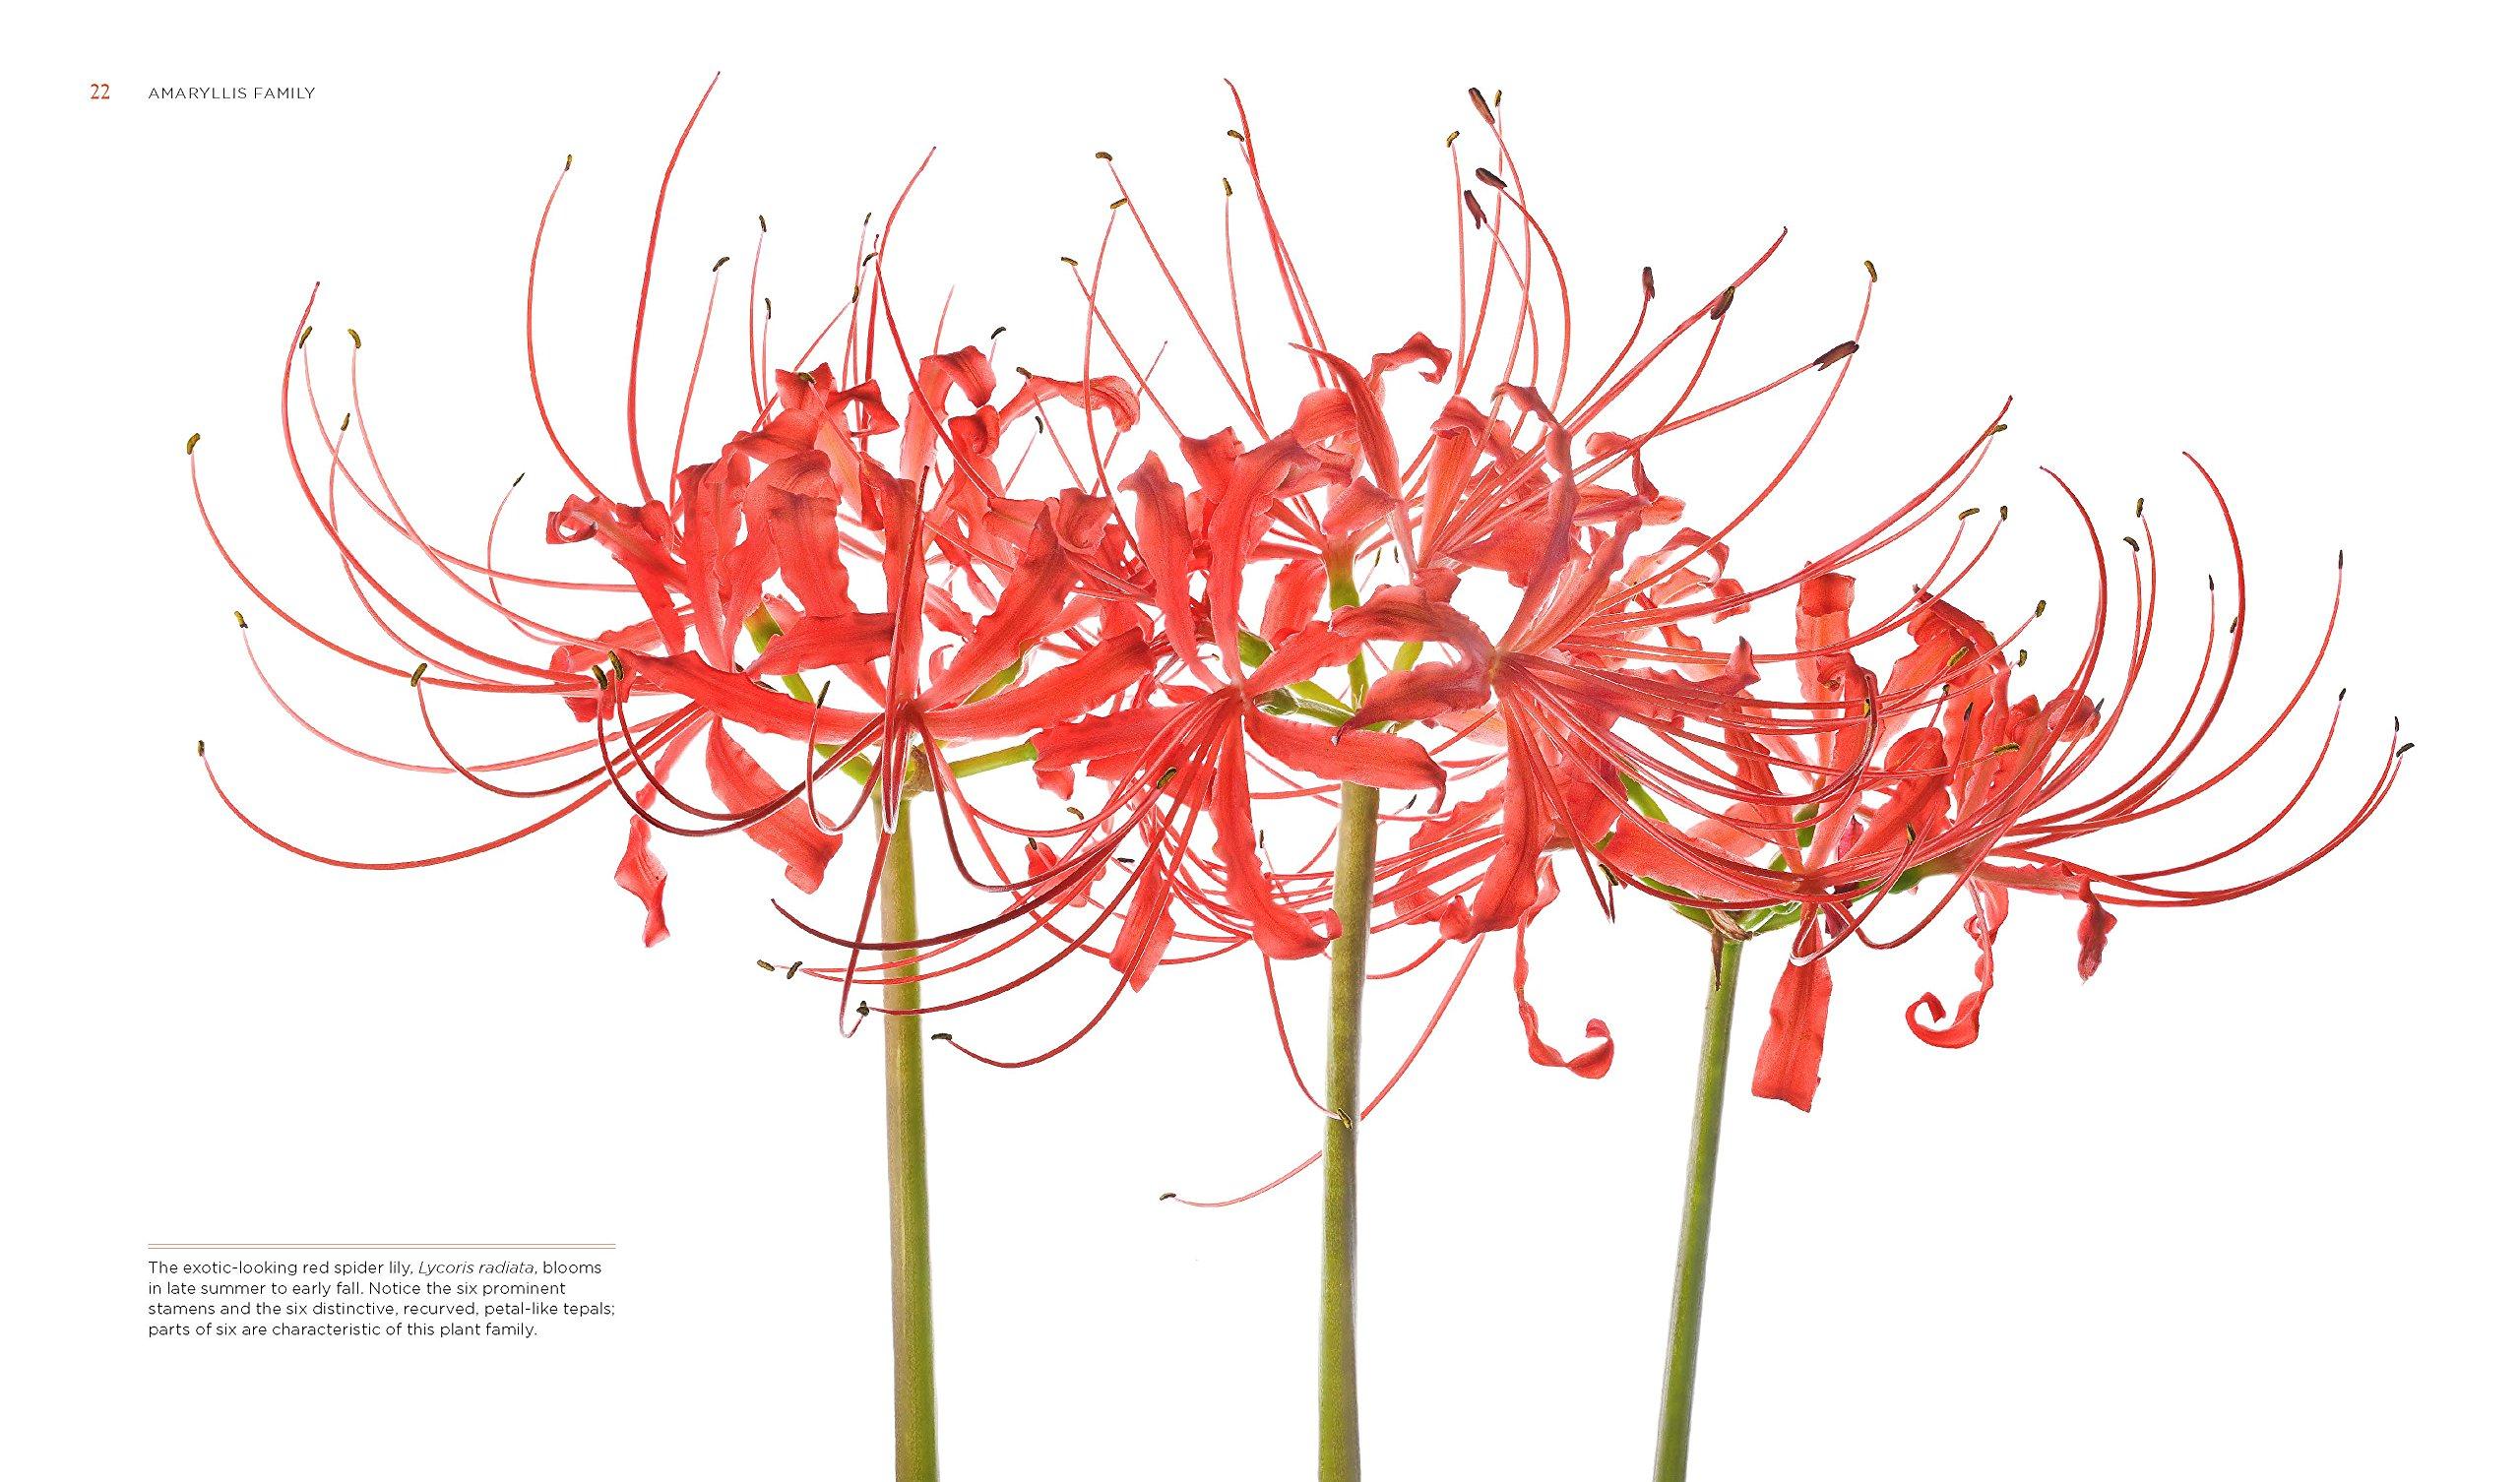 Amazon seeing flowers discover the hidden life of flowers amazon seeing flowers discover the hidden life of flowers seeing series 9781604694222 teri dunn chace robert llewellyn books izmirmasajfo